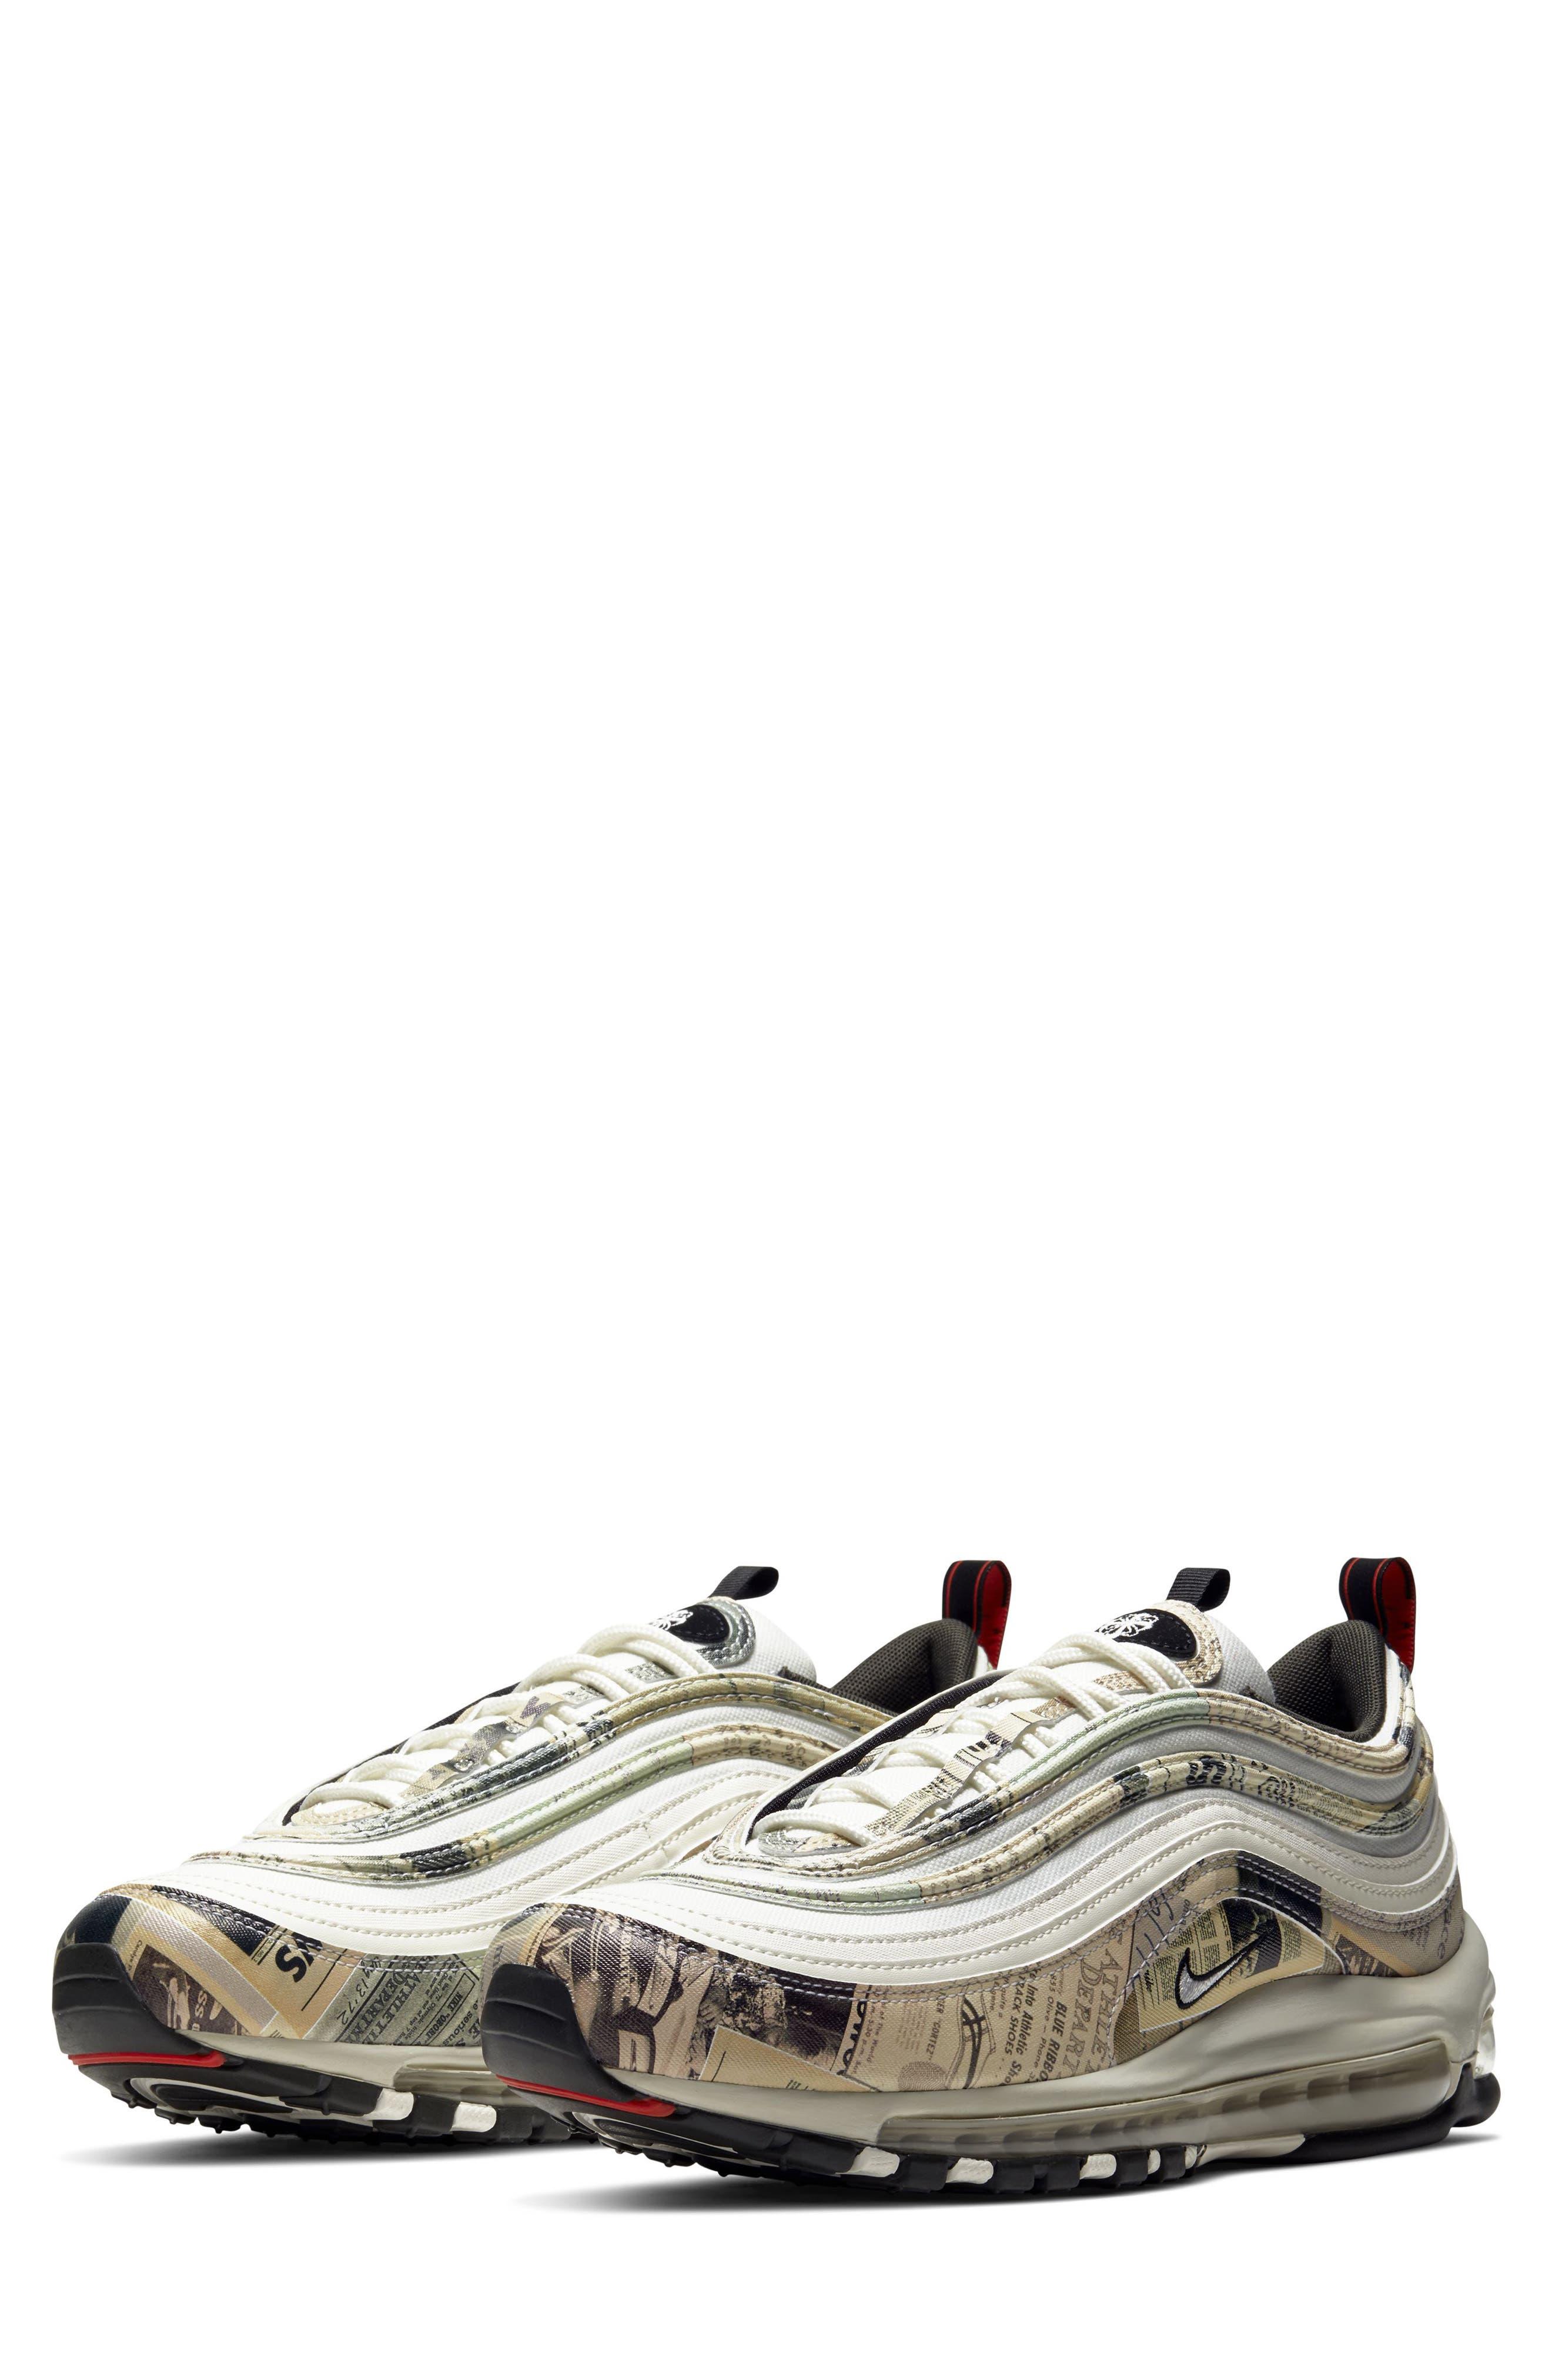 Nike Air Max 97 Damb Tech